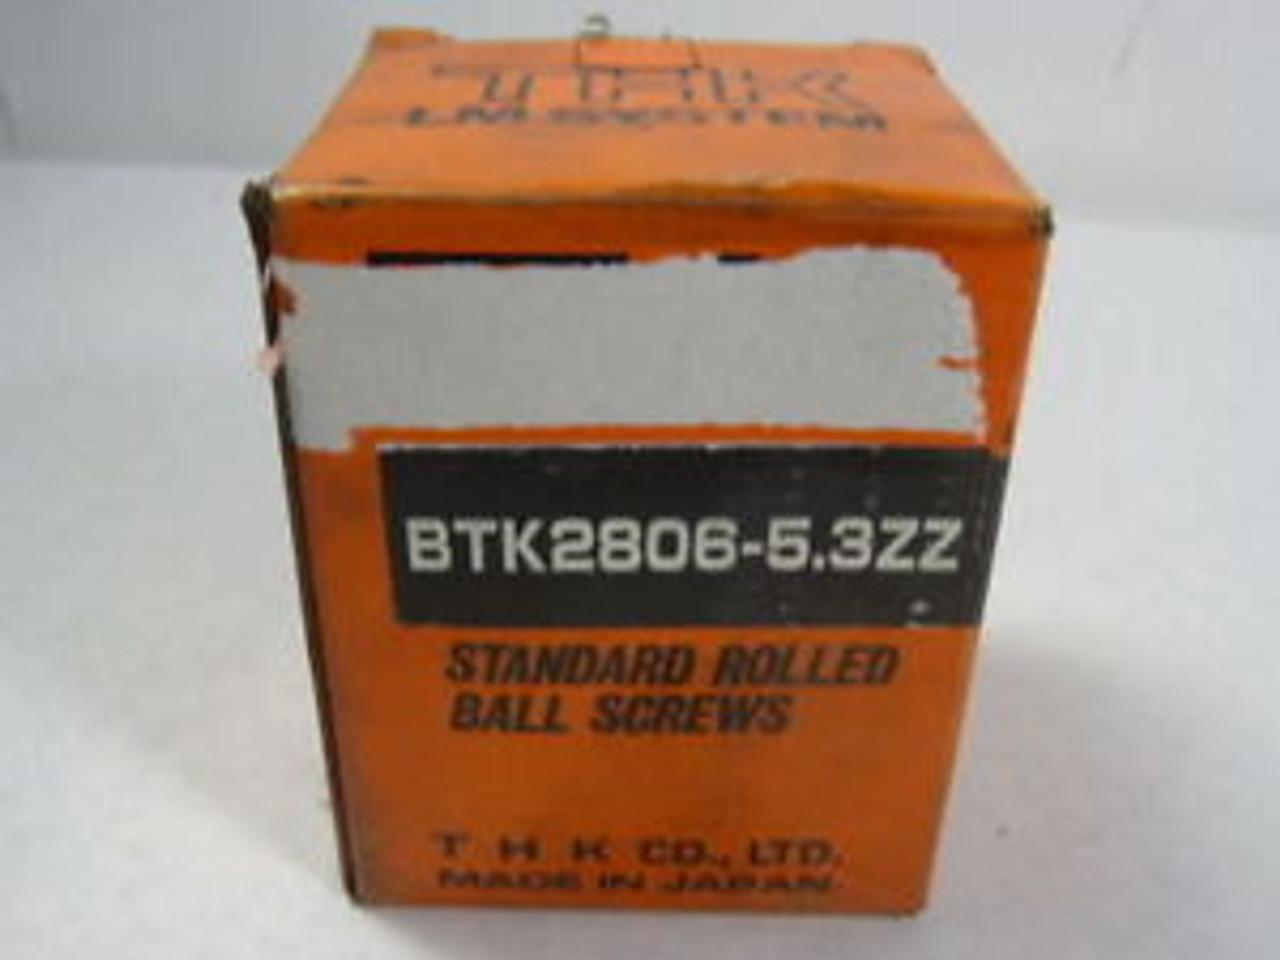 Nordiko THK Rolled Ball Screw Shaft TS3210800L A01843